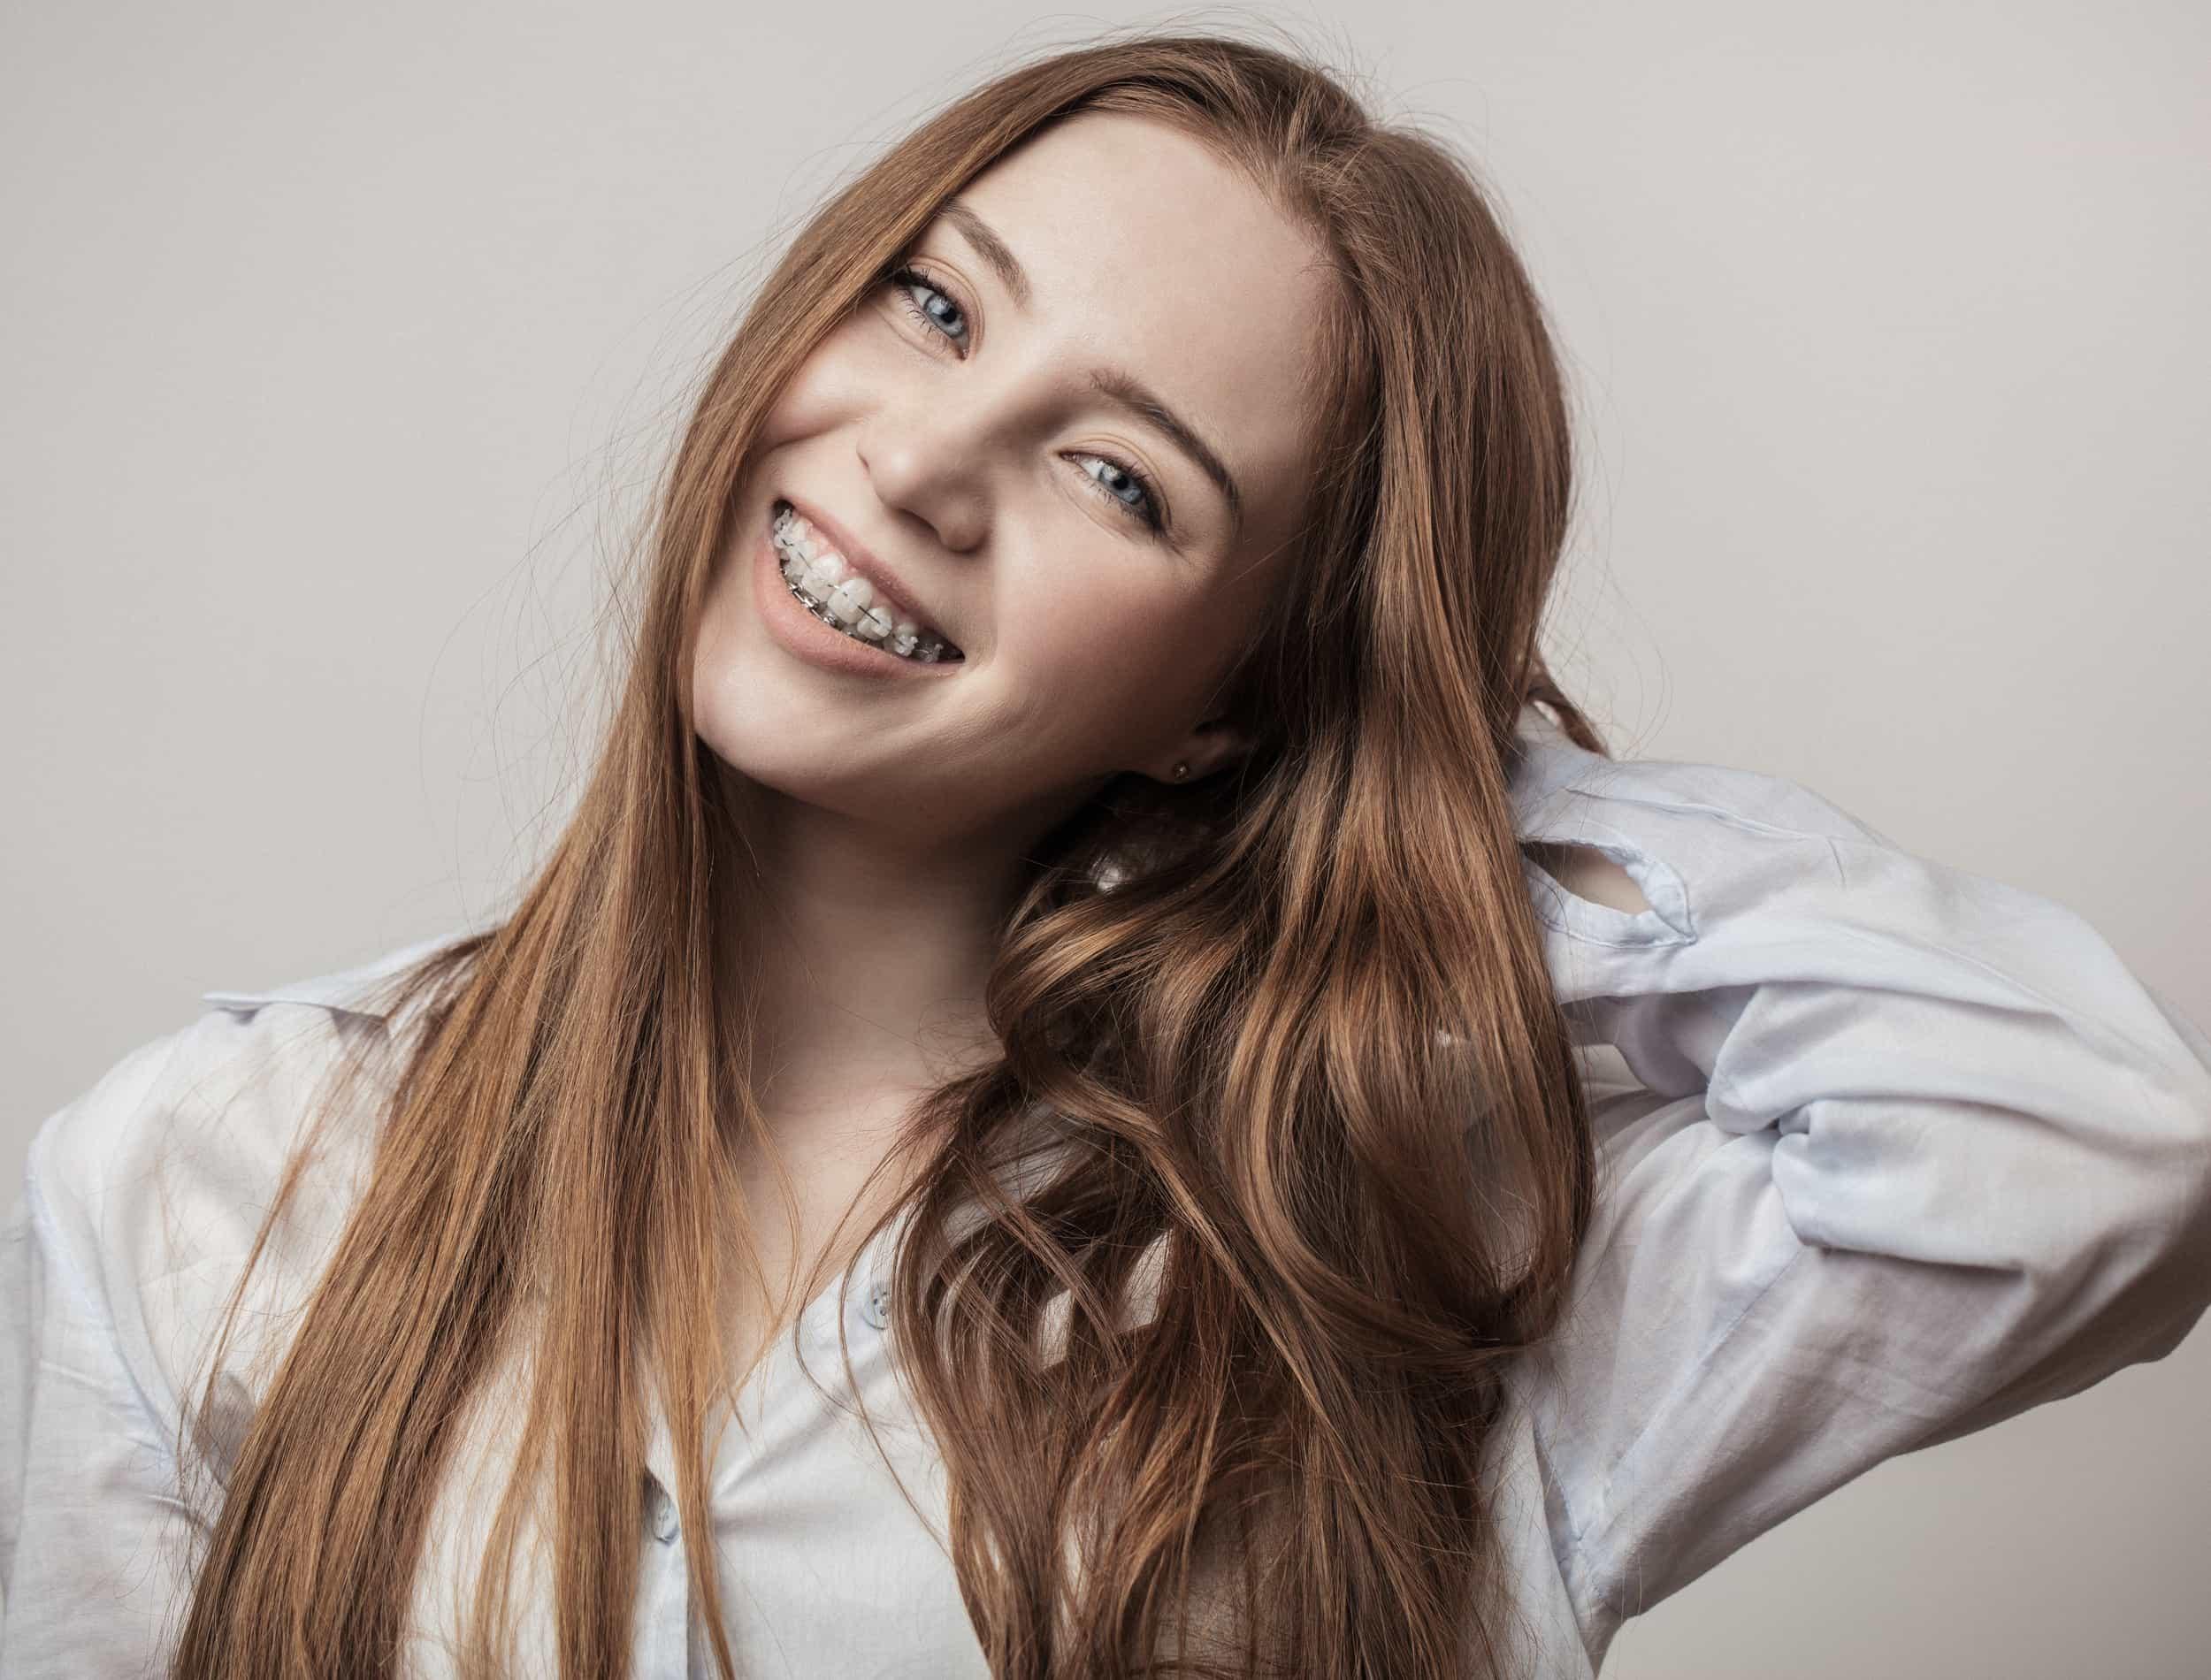 Teen smiling with braces iSmile Orthodontics Redmond WA